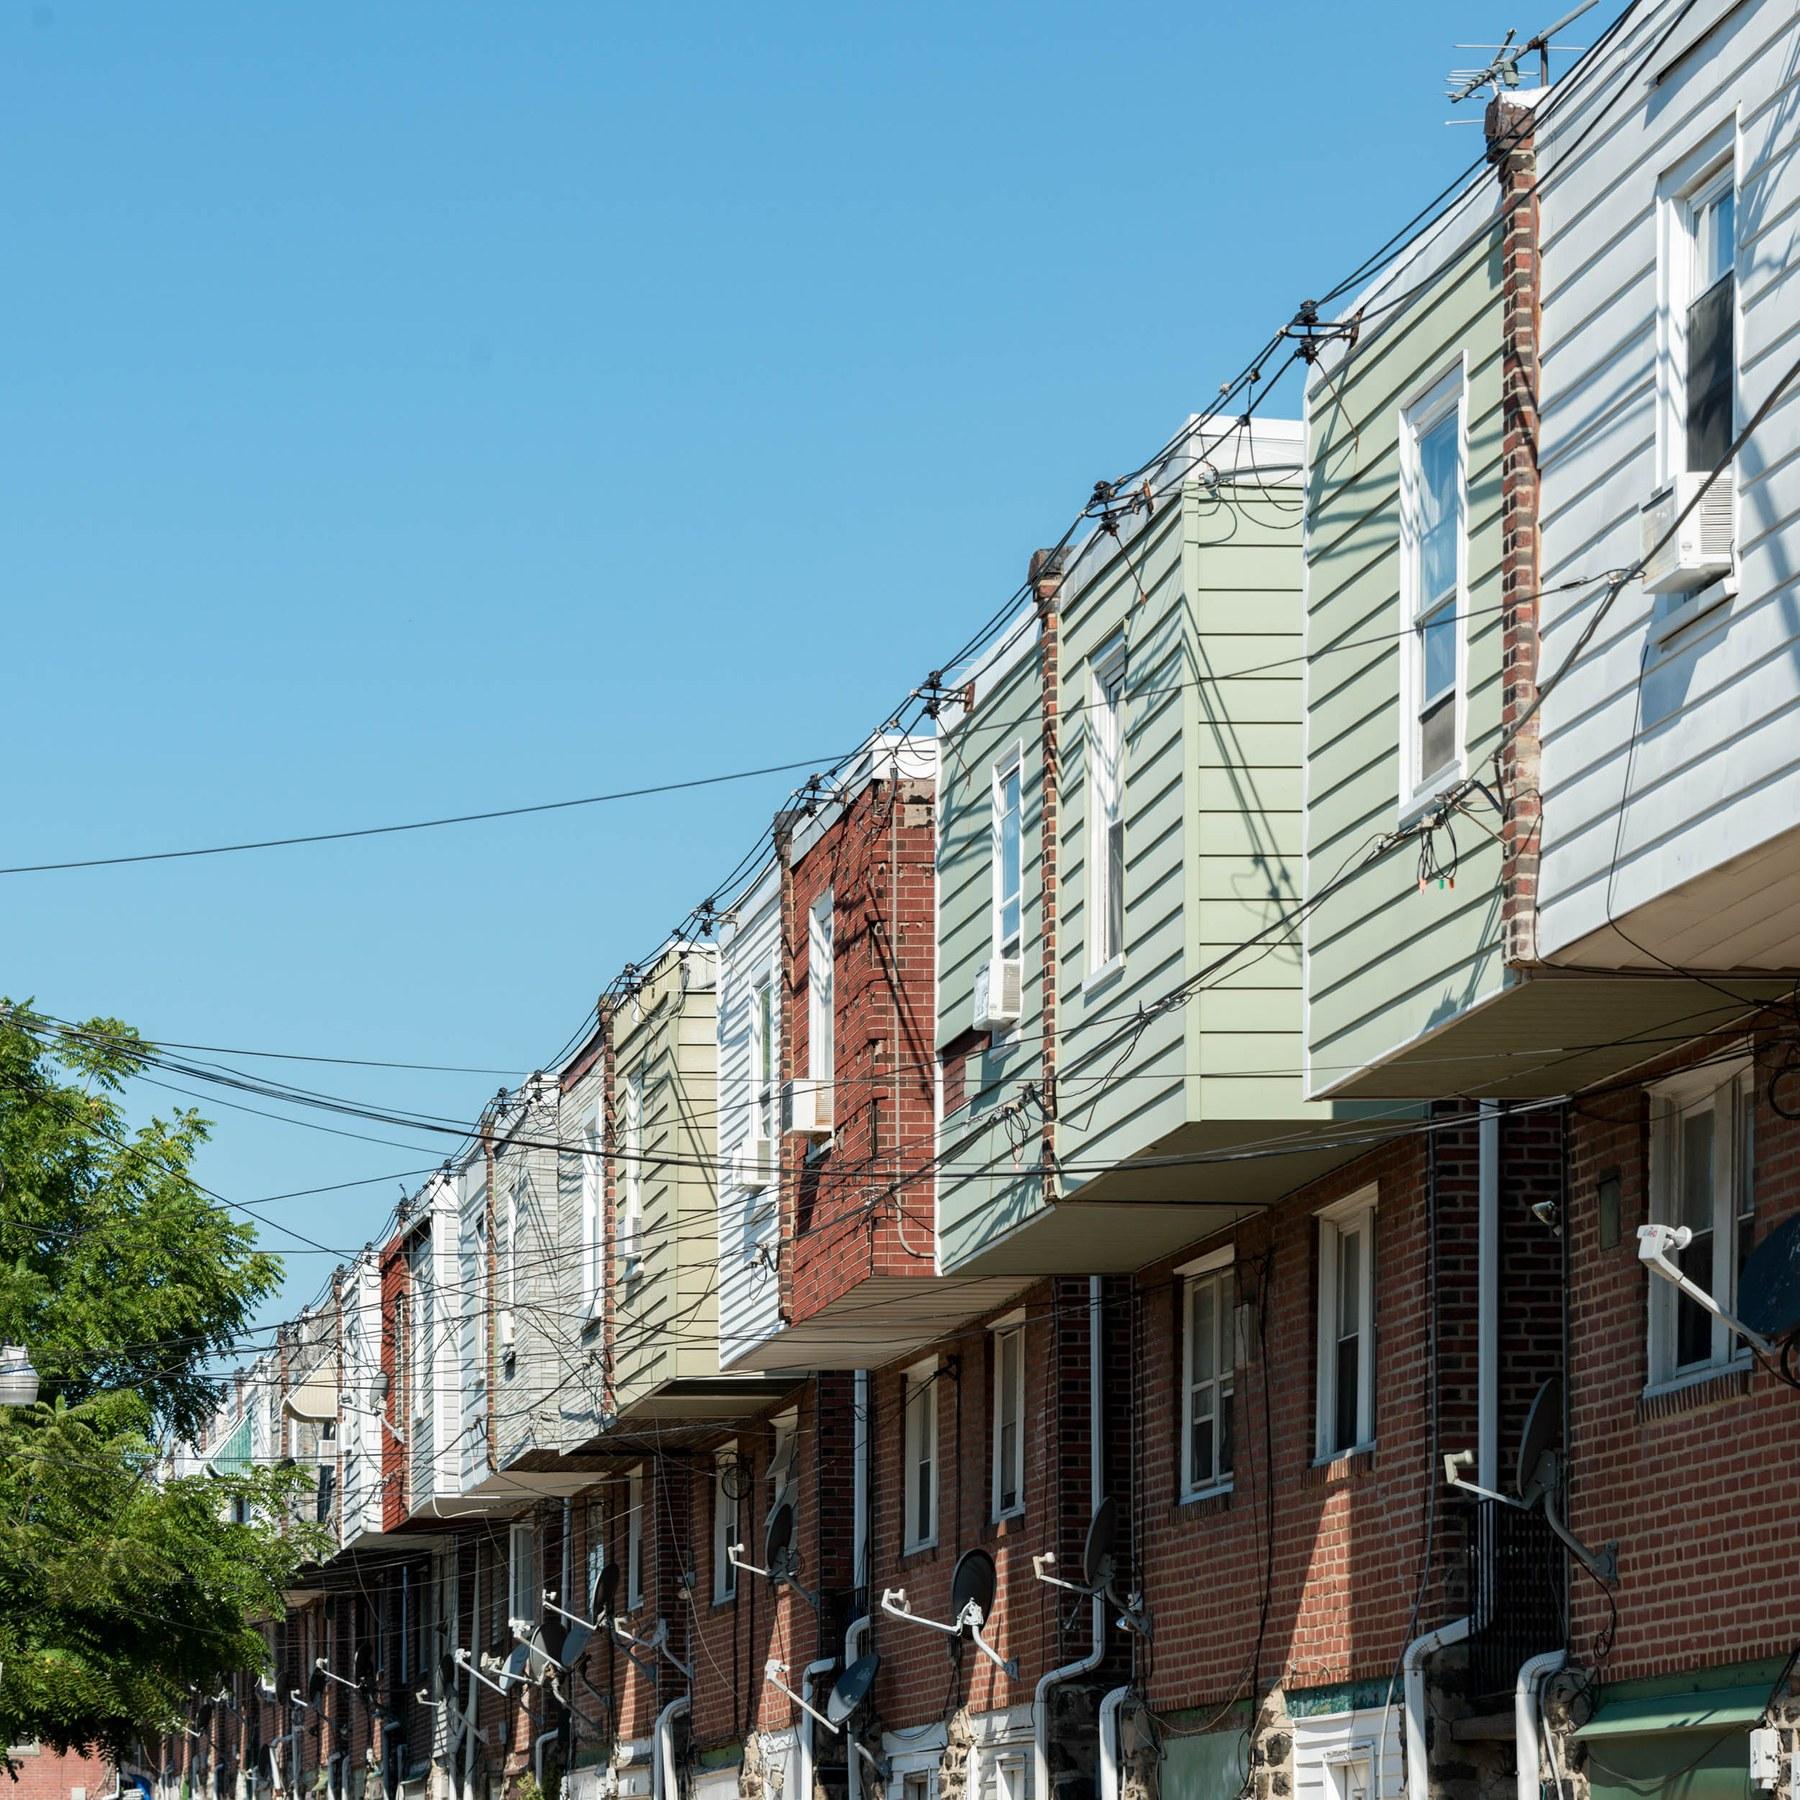 Local Com Homes For Rent: Olney, Philadelphia PA - Neighborhood Guide